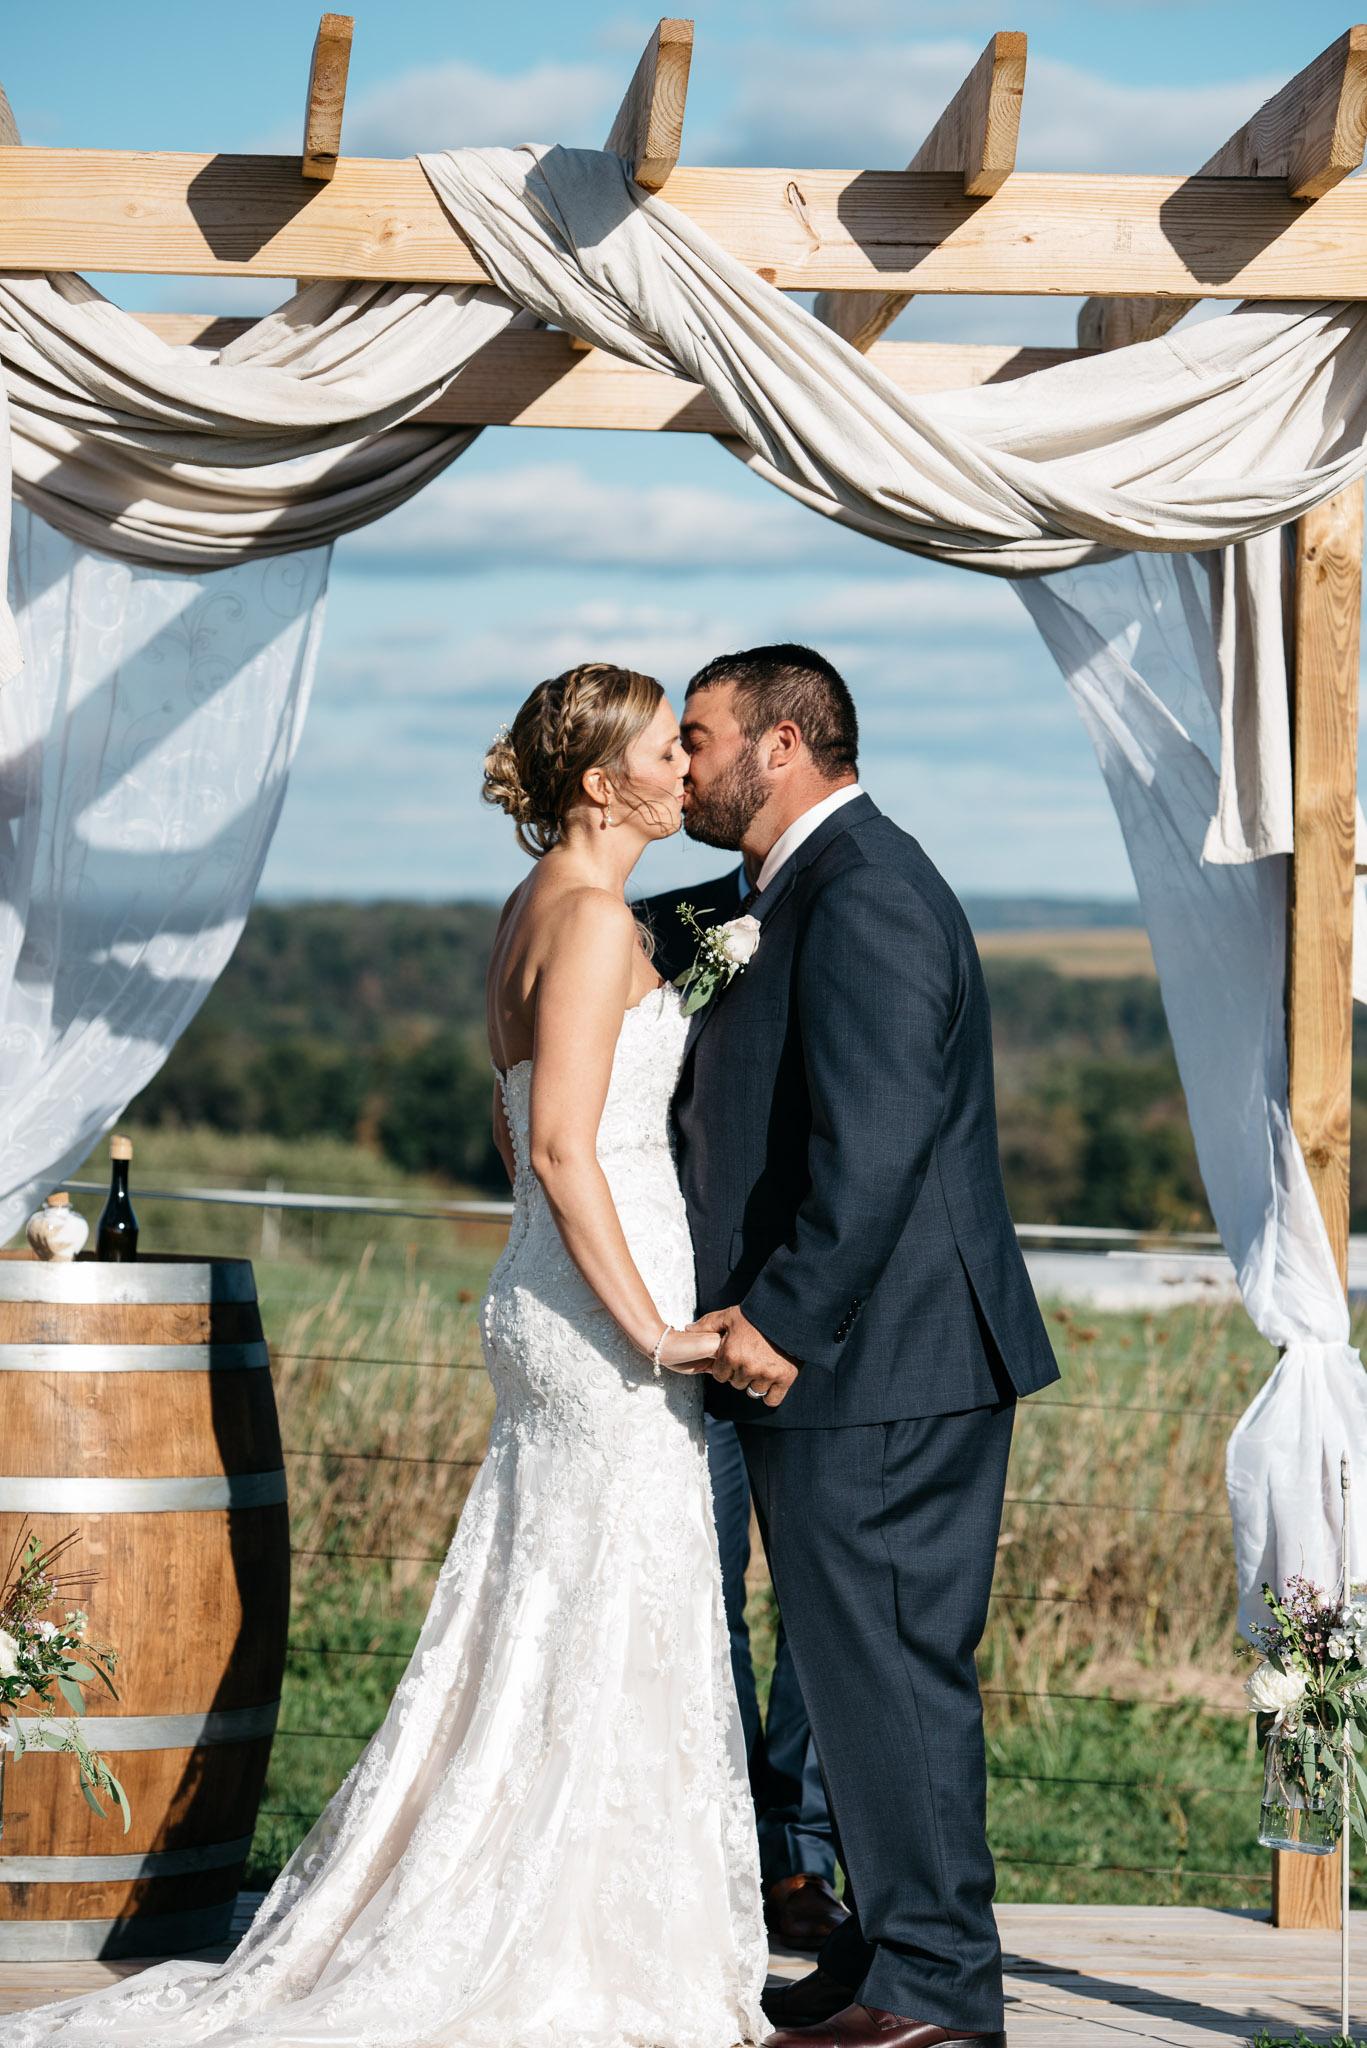 pittsburgh-ligonier-wedding-photographer-the-event-barn-at-highland-farms-25.jpg